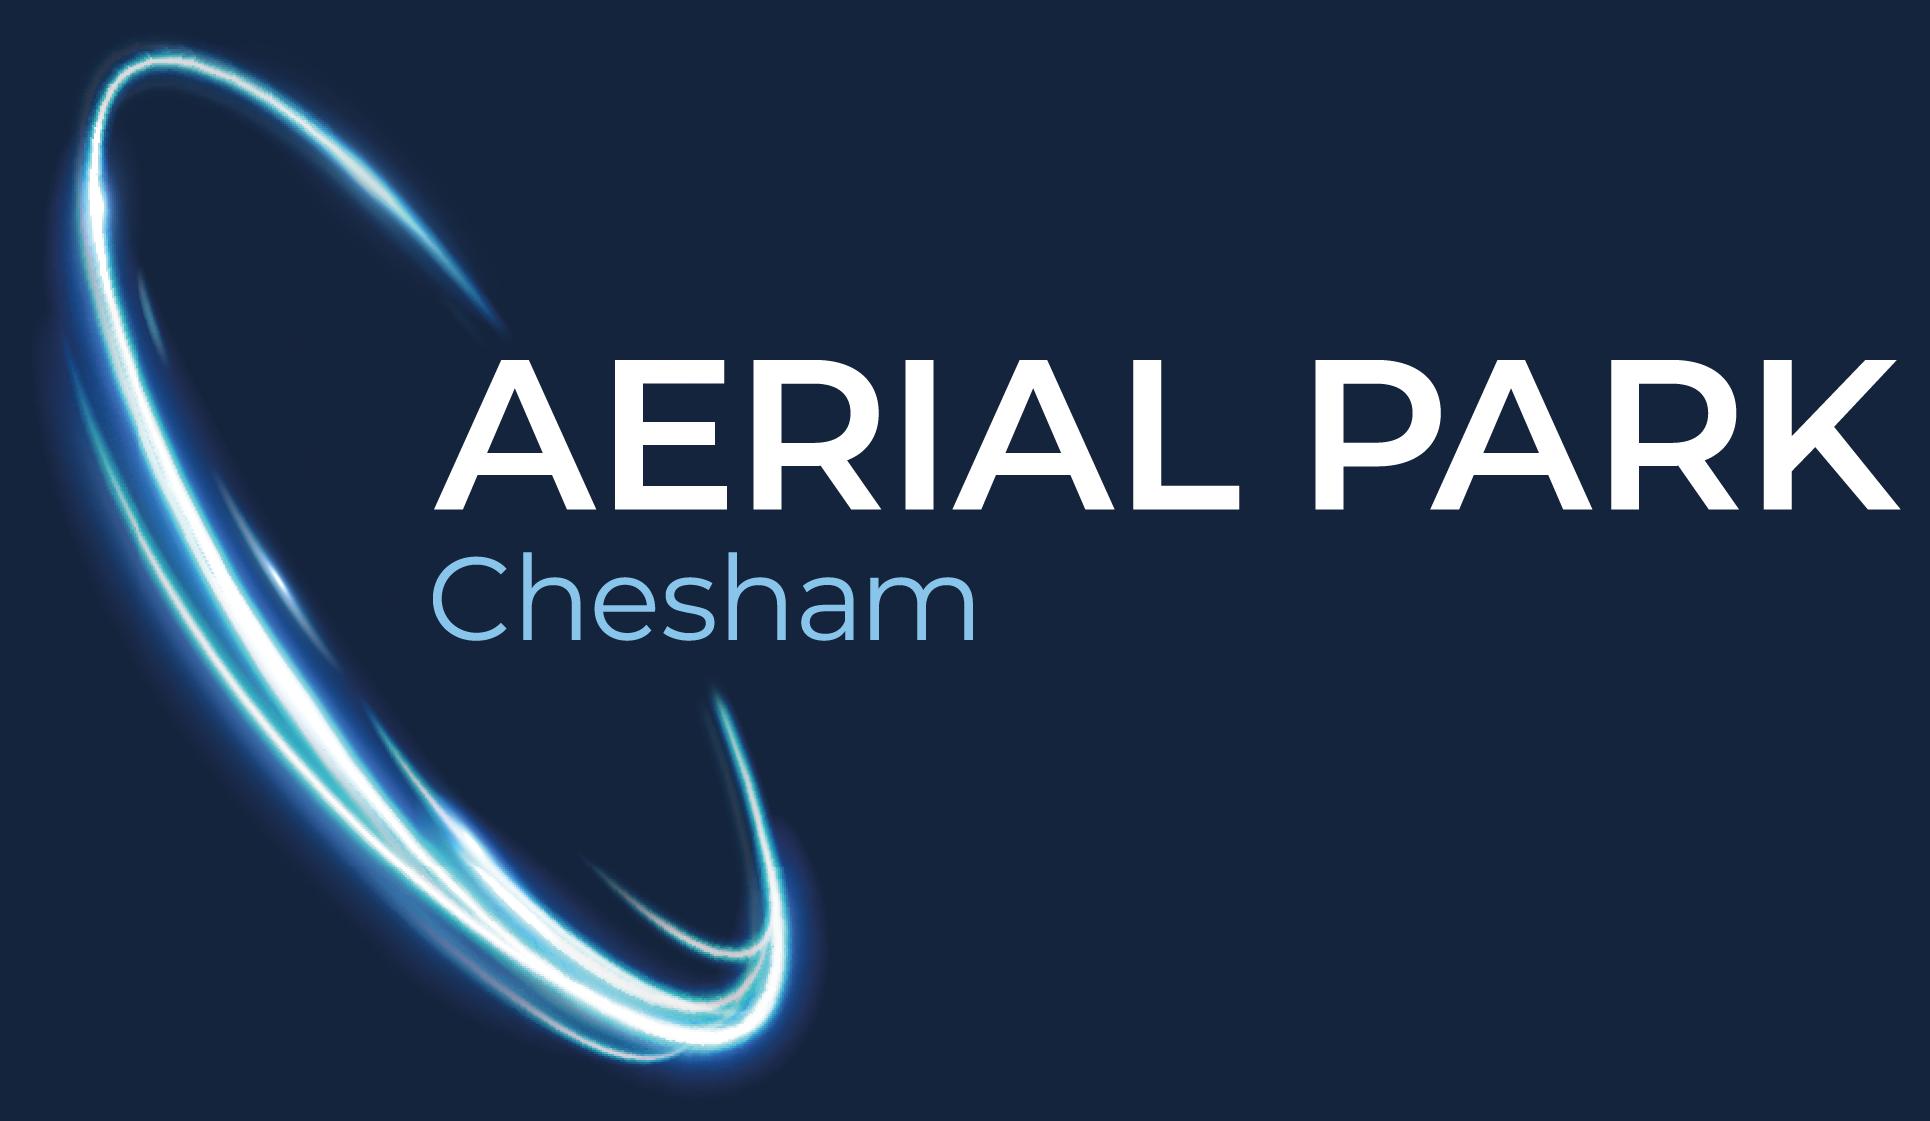 Aerial Park, Chesham